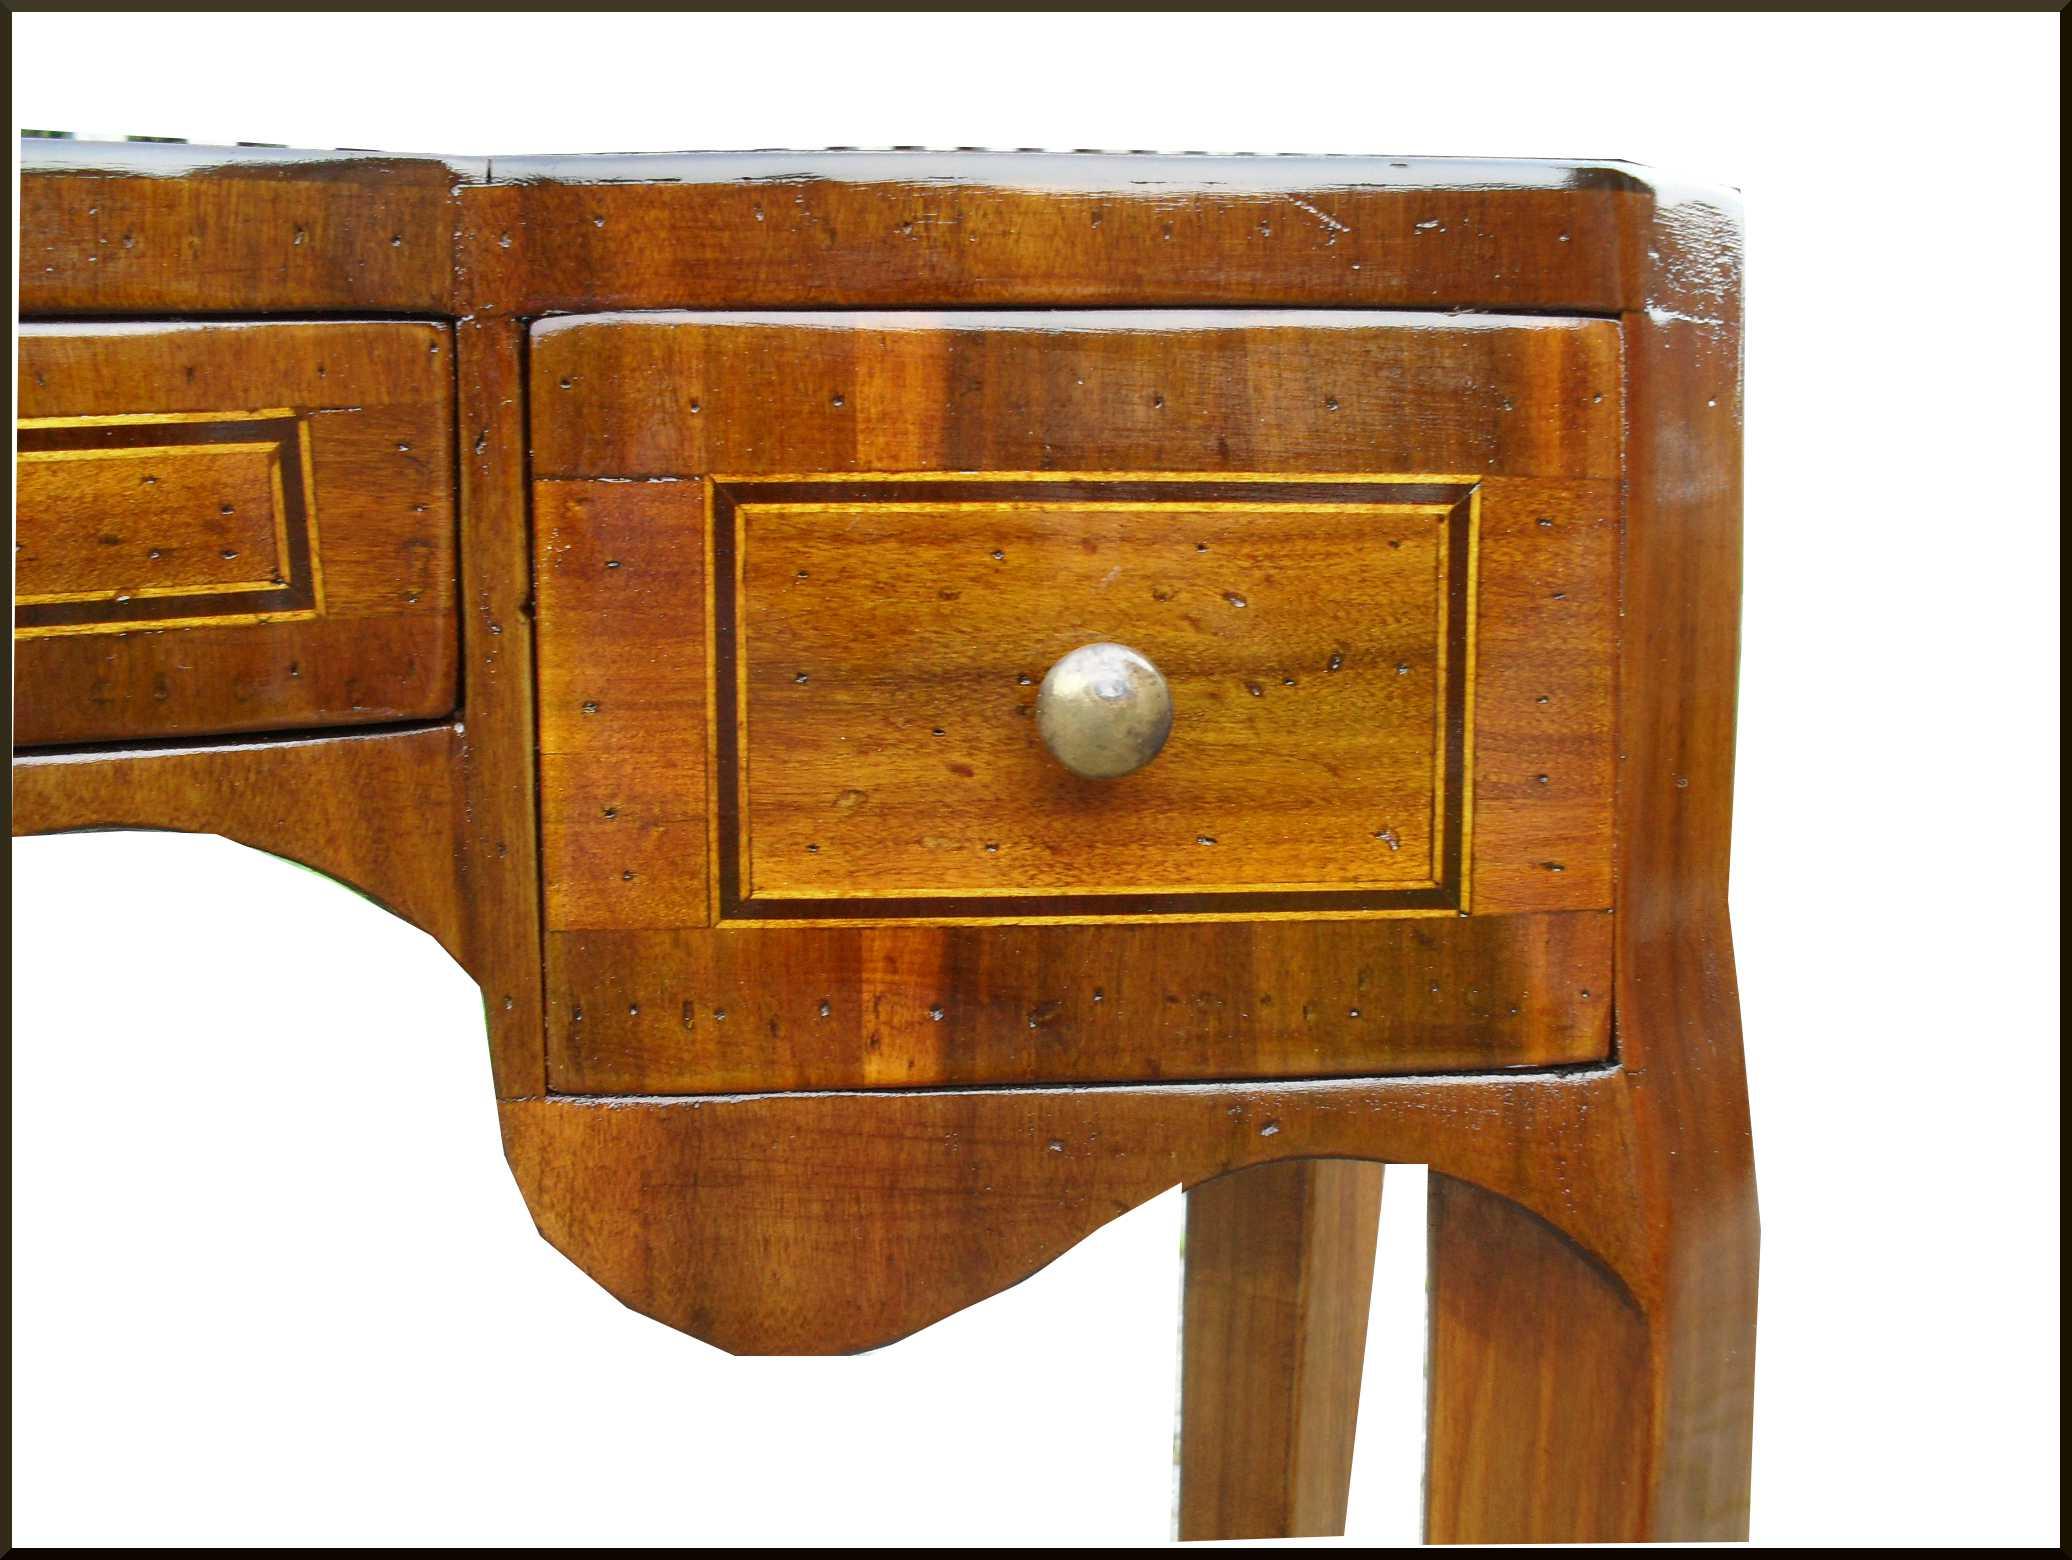 Tavolino poco profondo intarsiato a mano